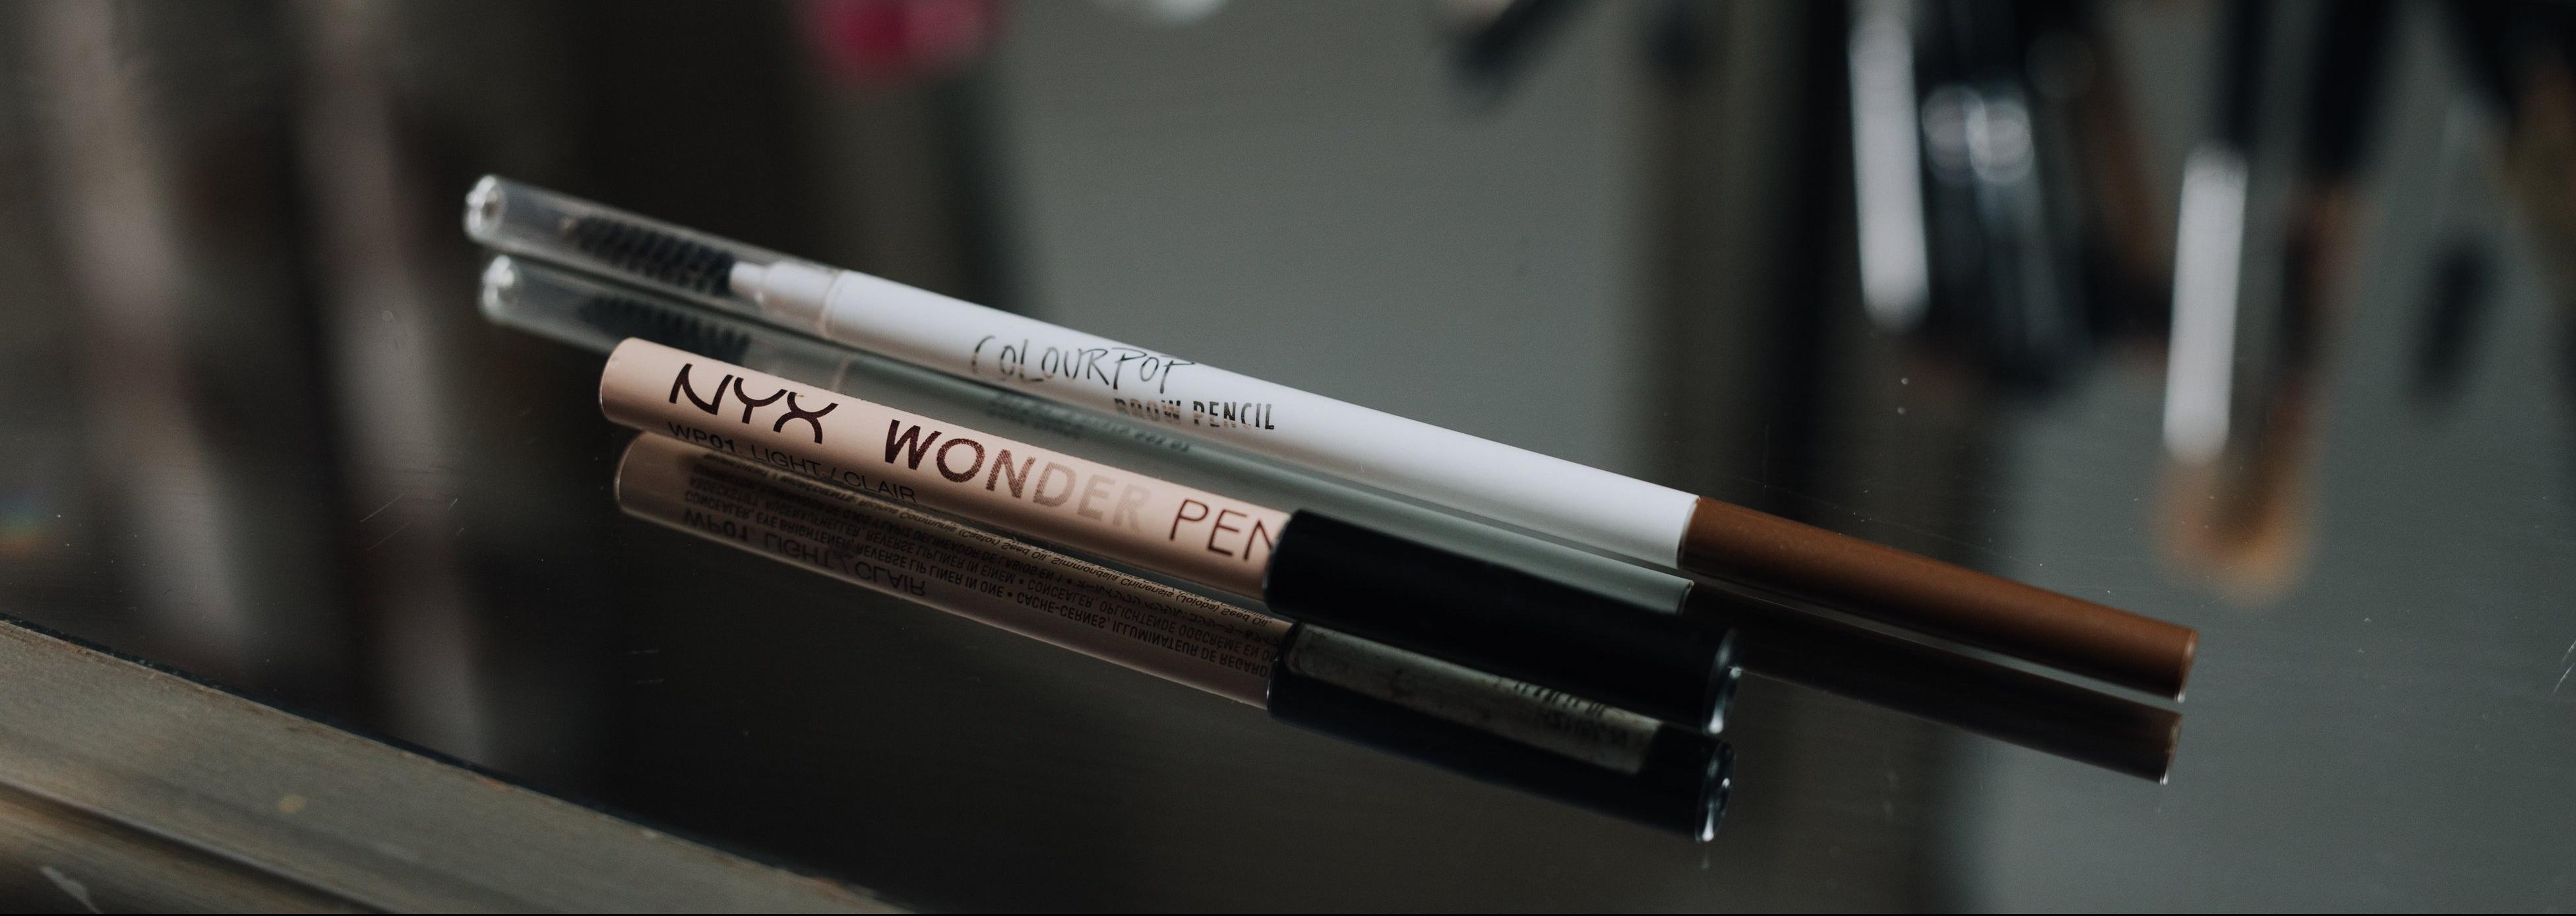 makeup-blog-0001-e1504196199223.jpg